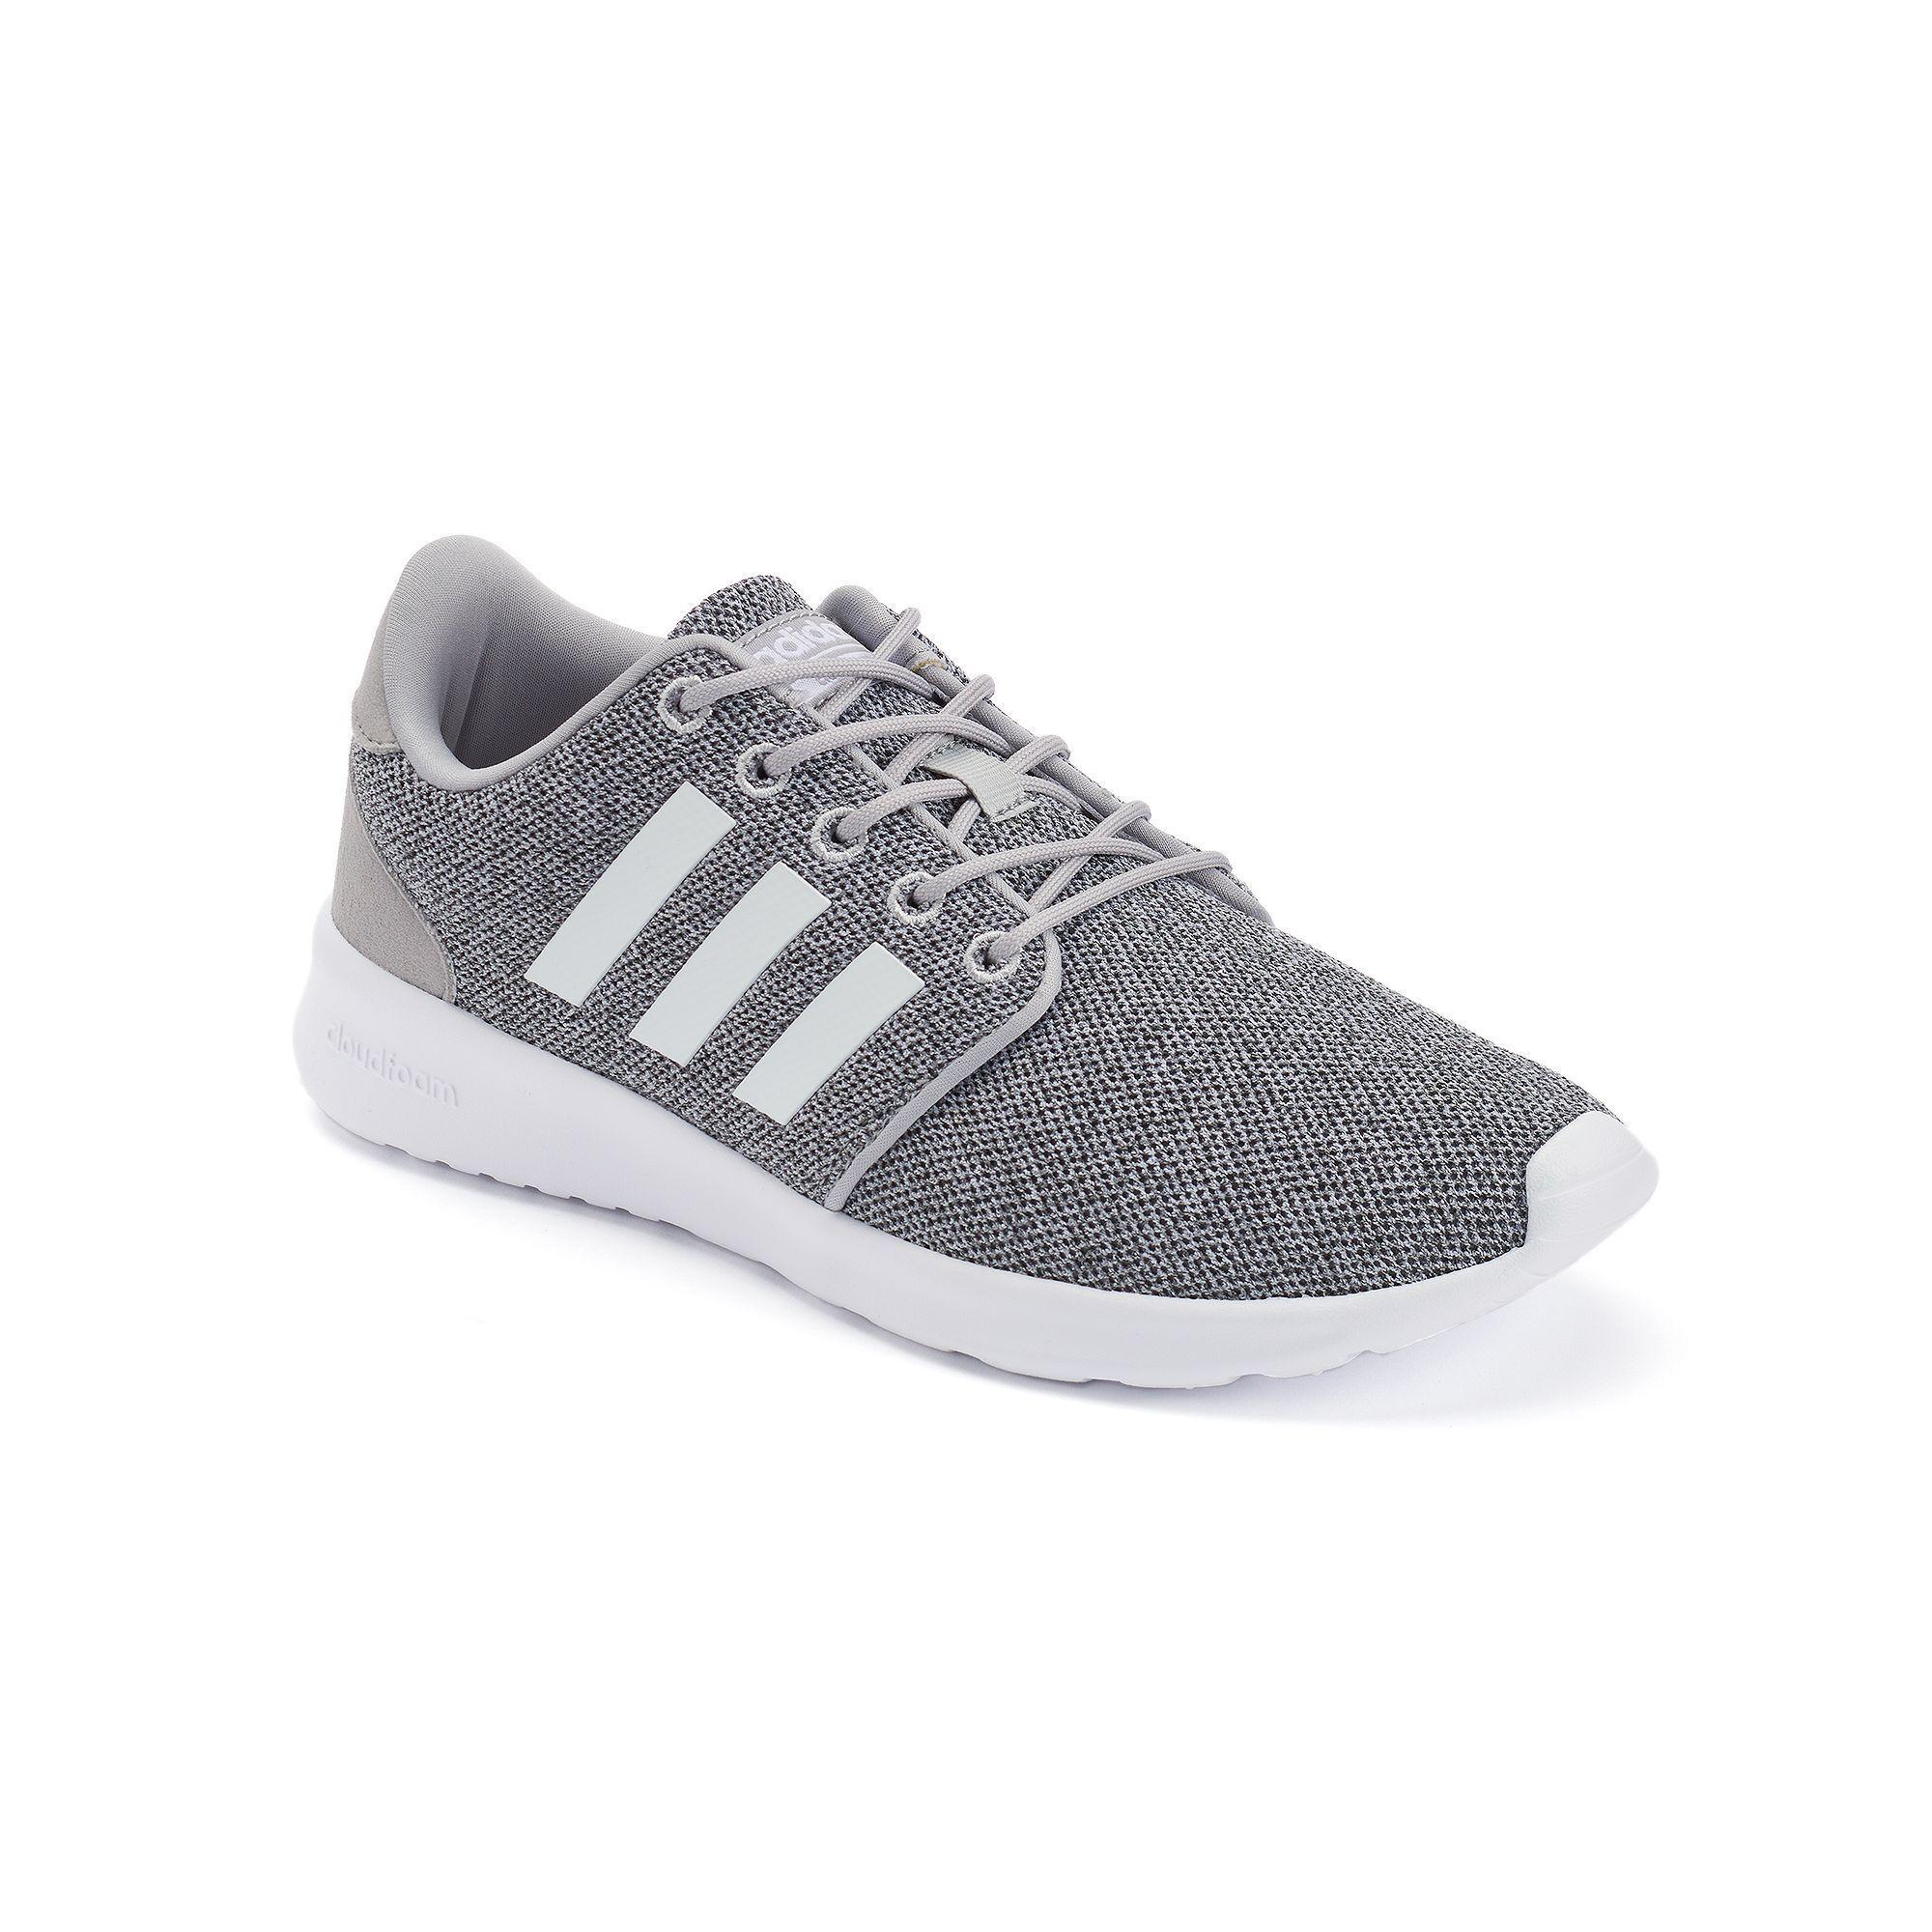 offer discounts preview of arrives Adidas NEO Cloudfoam QT Racer Women's Shoes, Size: 7.5 ...